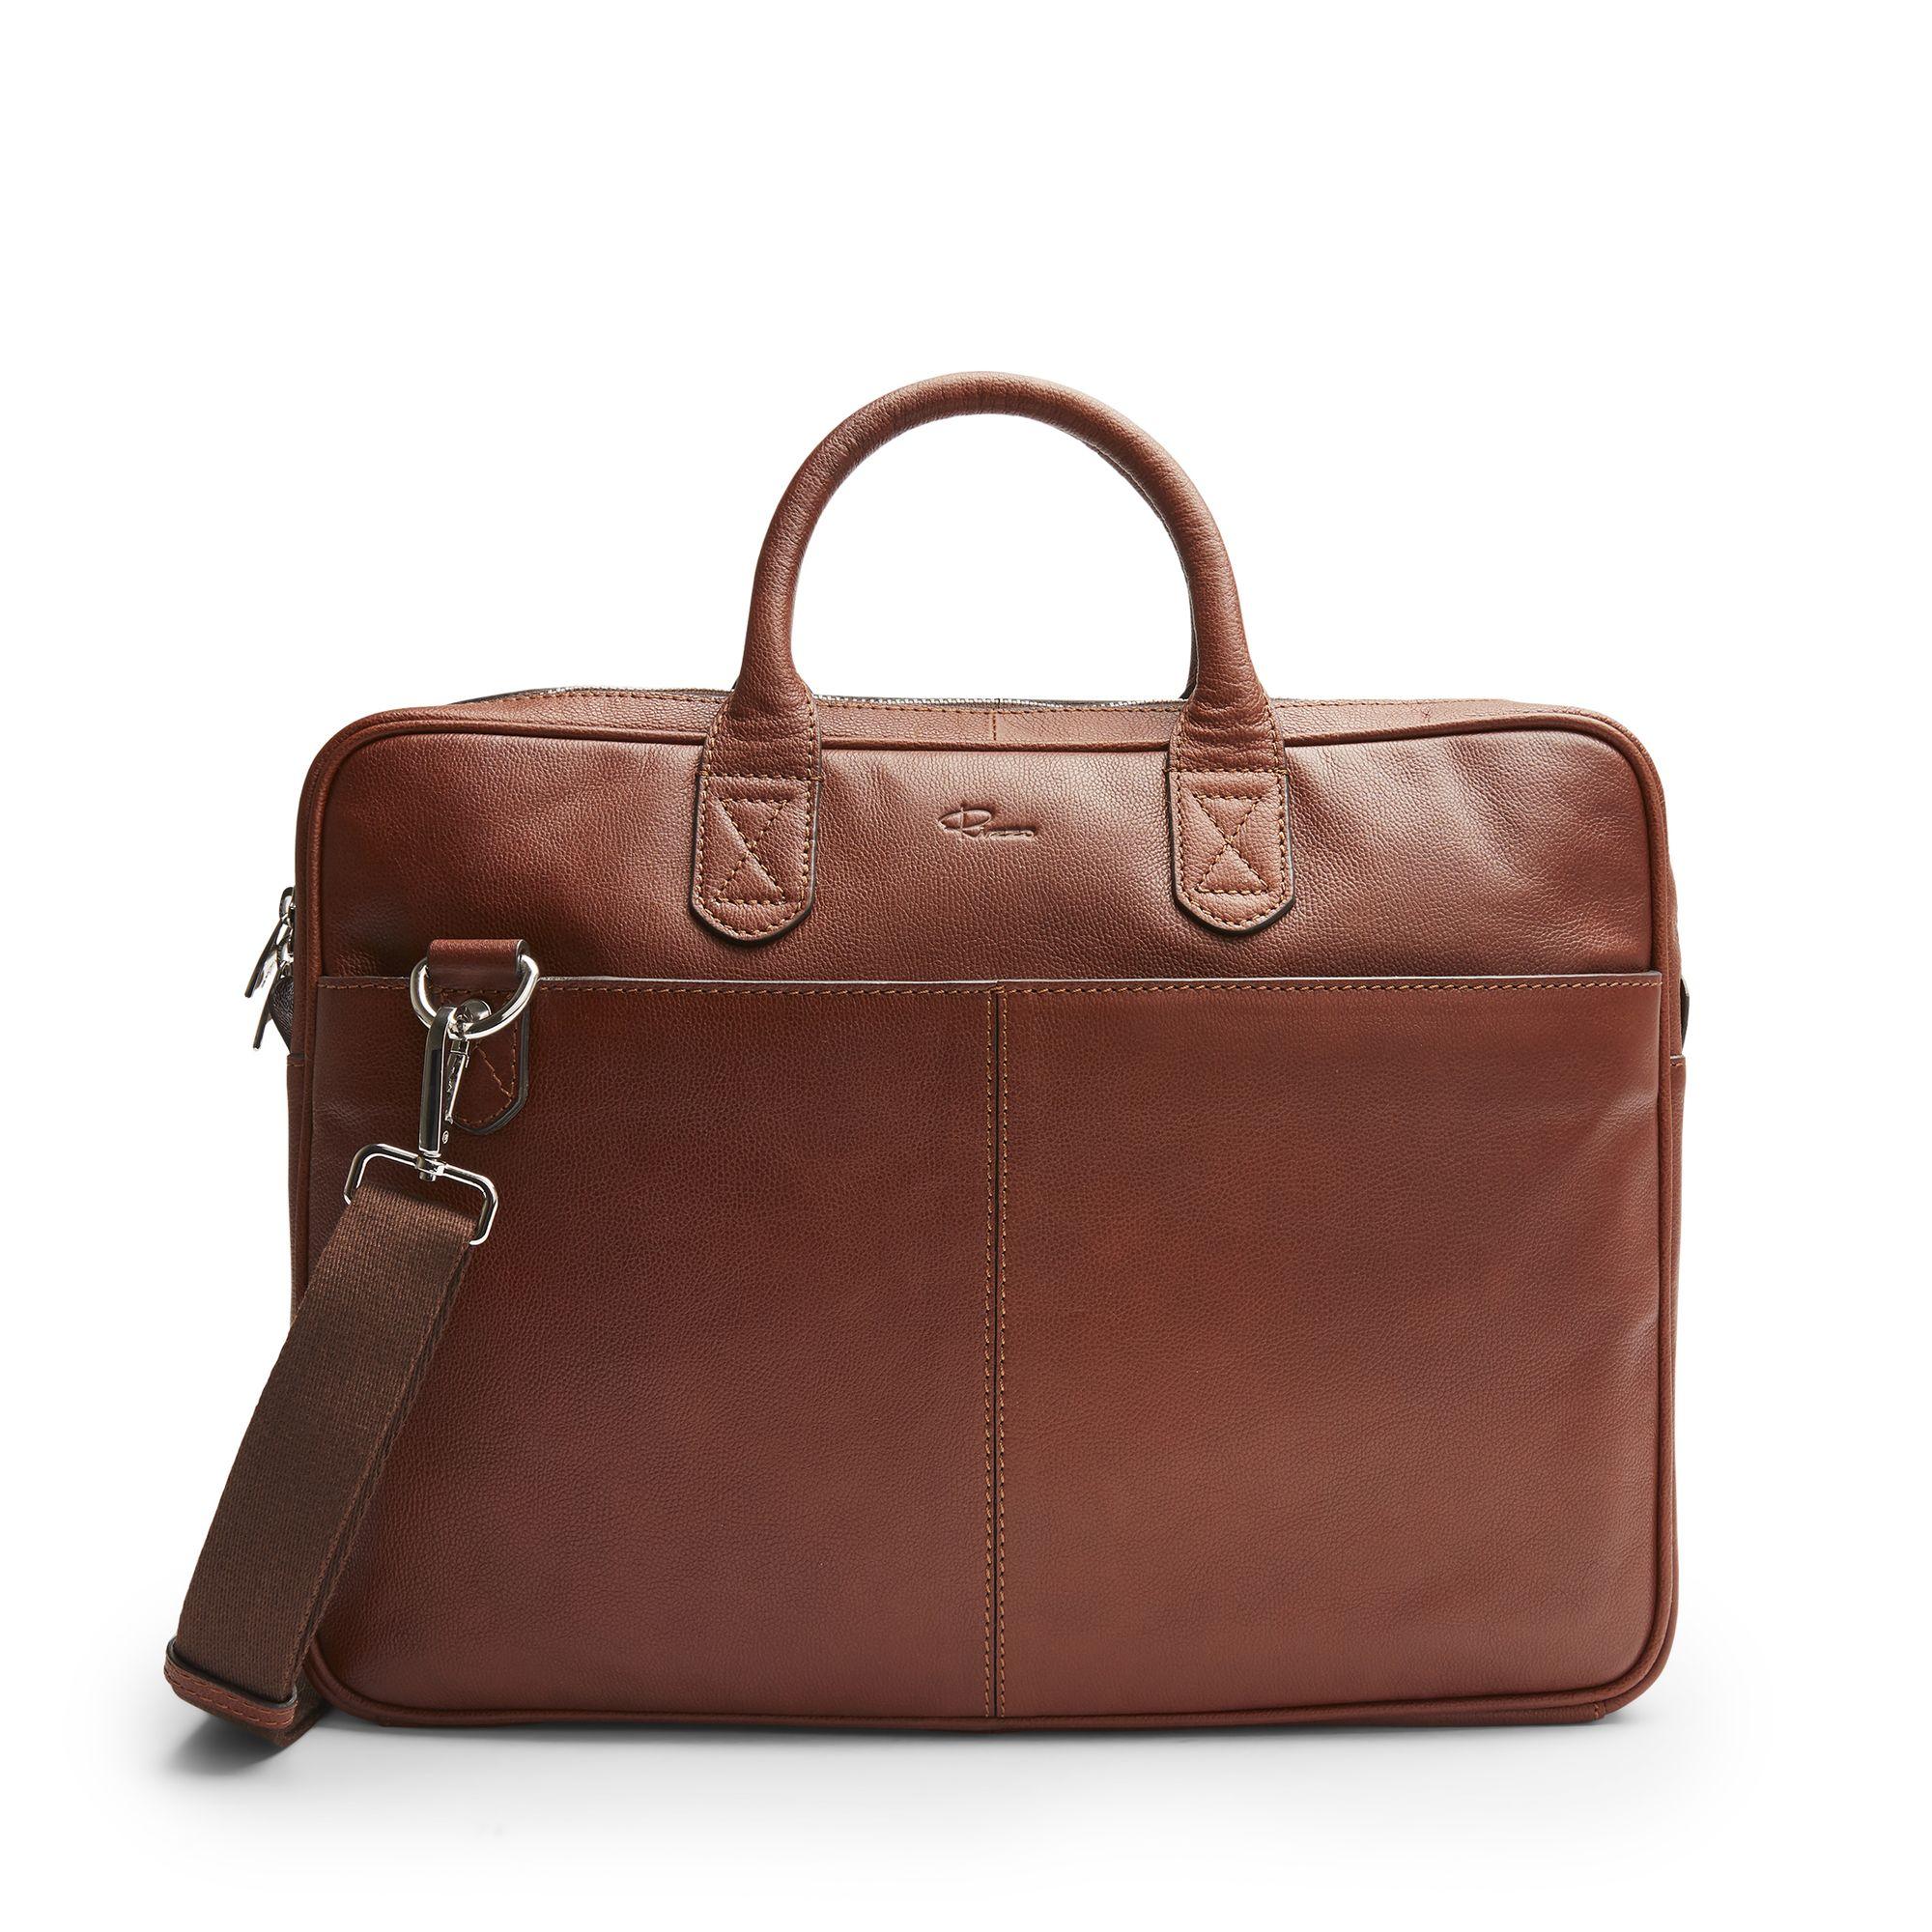 DD Mark Slim Briefcase, portfölj i skinn, Cognac